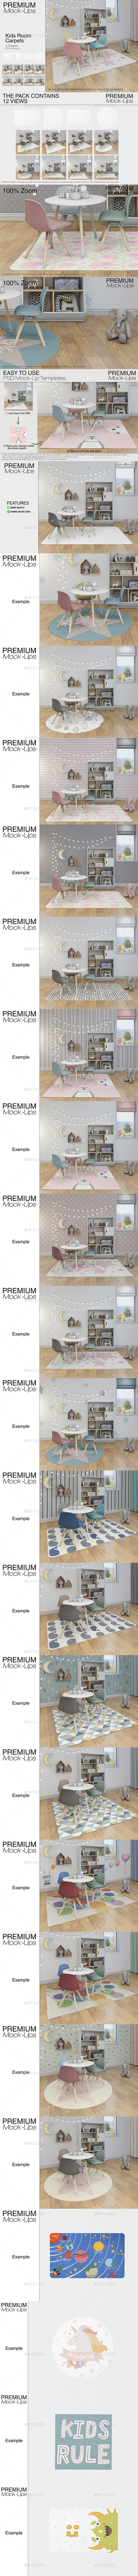 Kids Room Carpets - 4 Shapes - Print Product Mock-Ups